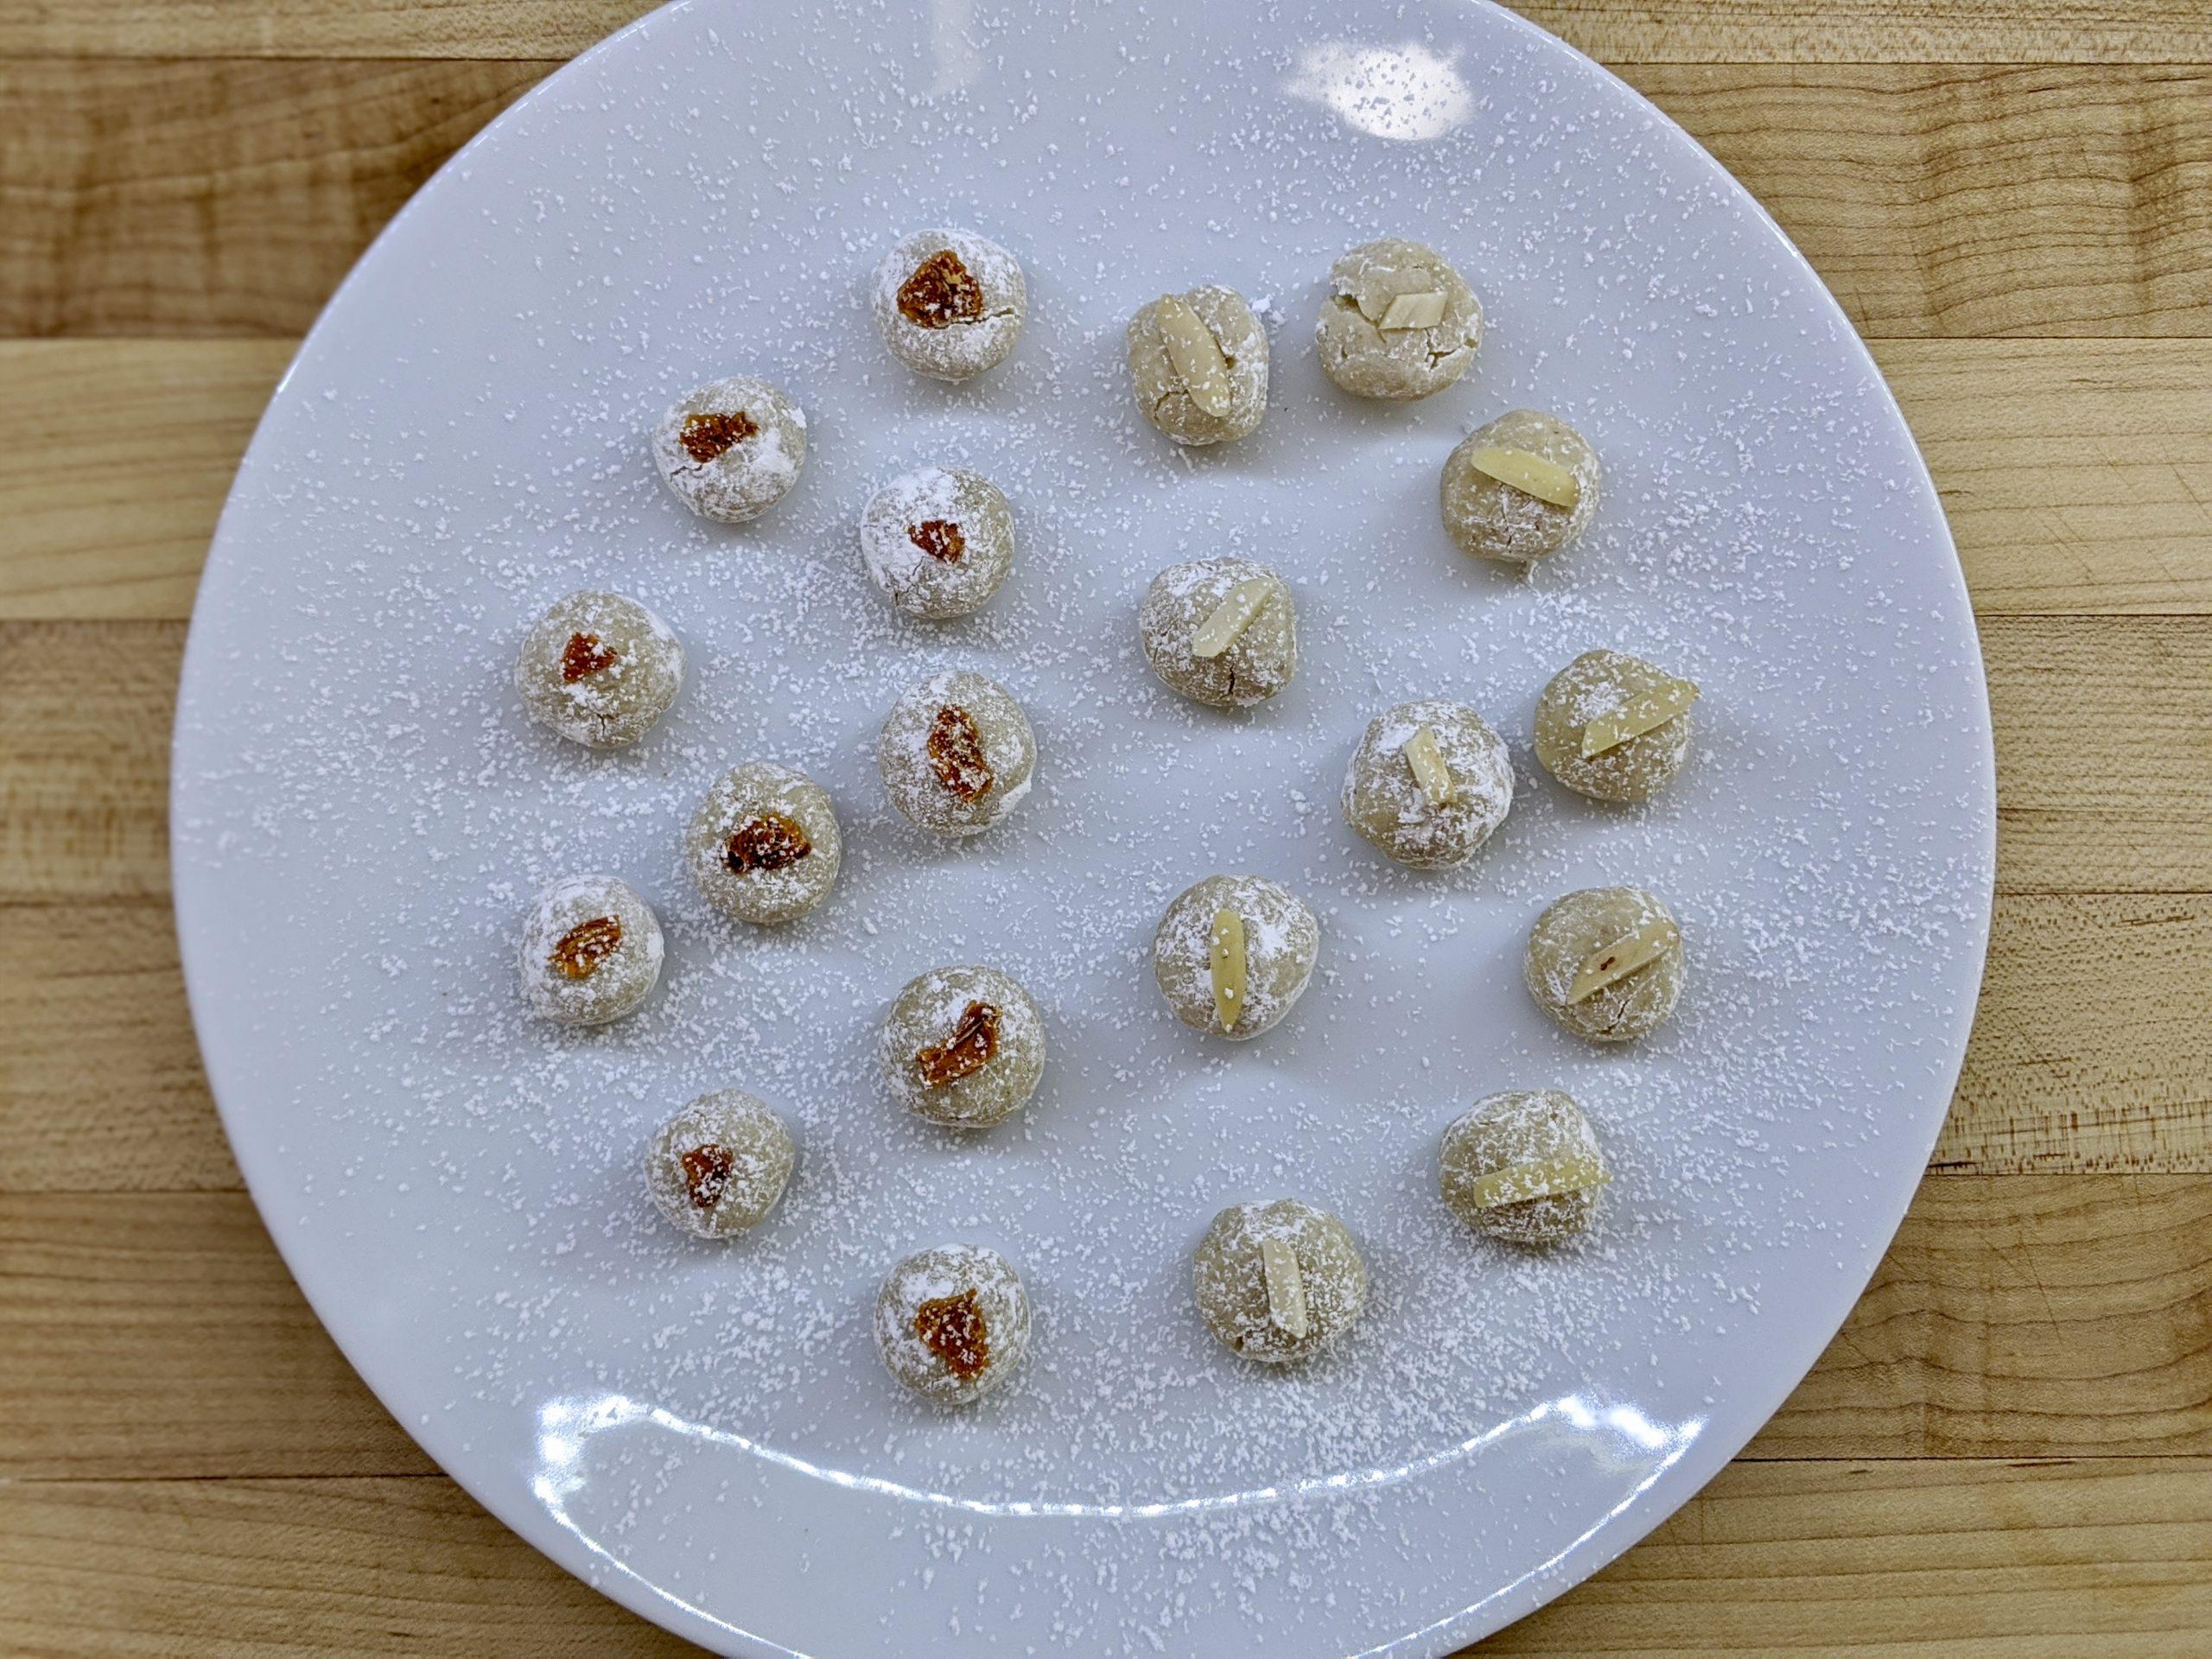 Meal 78 - Amandines - Almond Balls